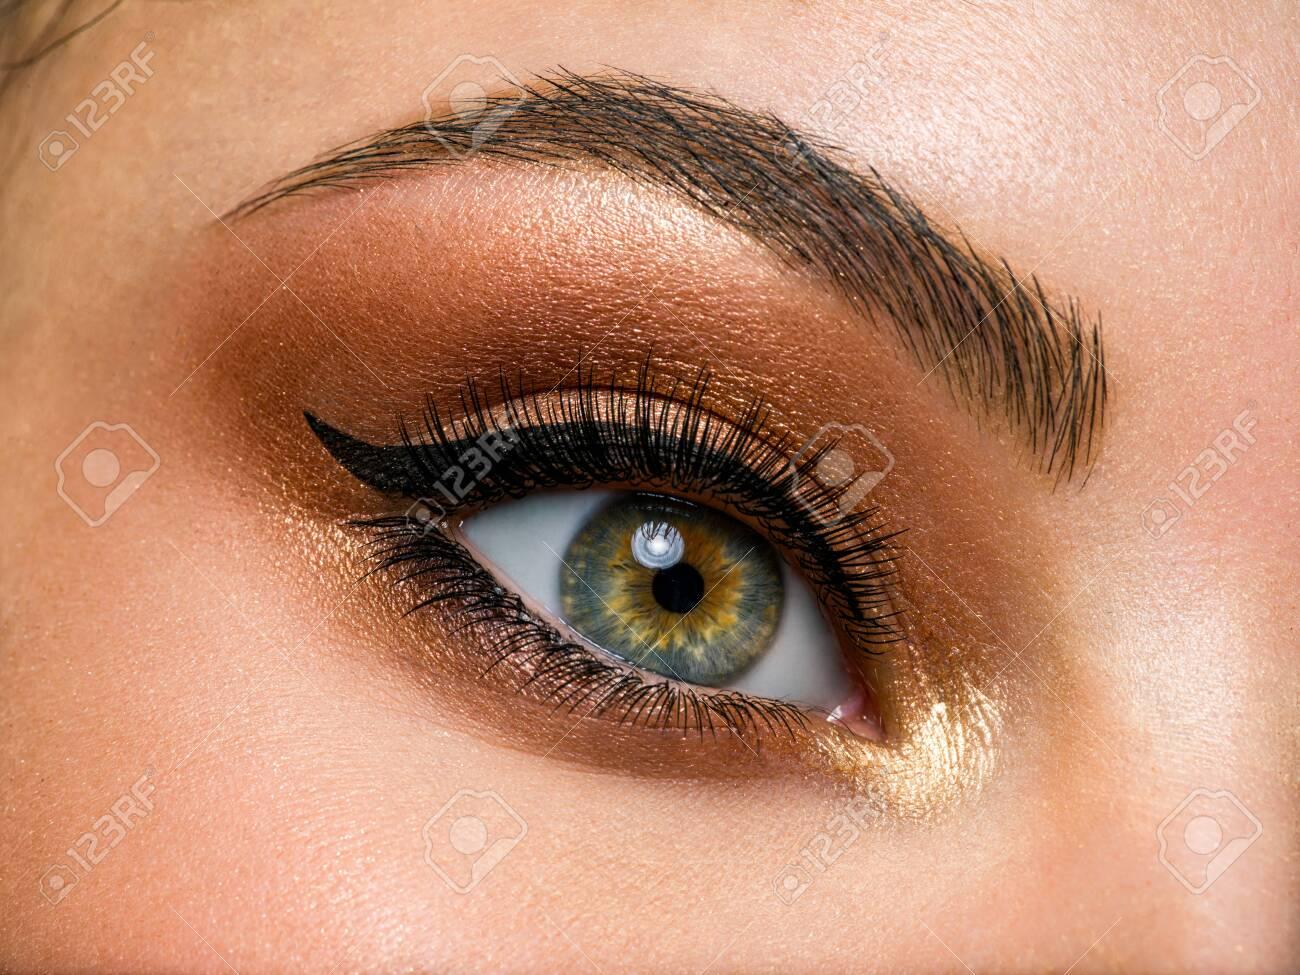 Beautiful female eye with brown, shiny makeup. Fashionable brown makeup. Macro image of a woman's eye. - 156777832